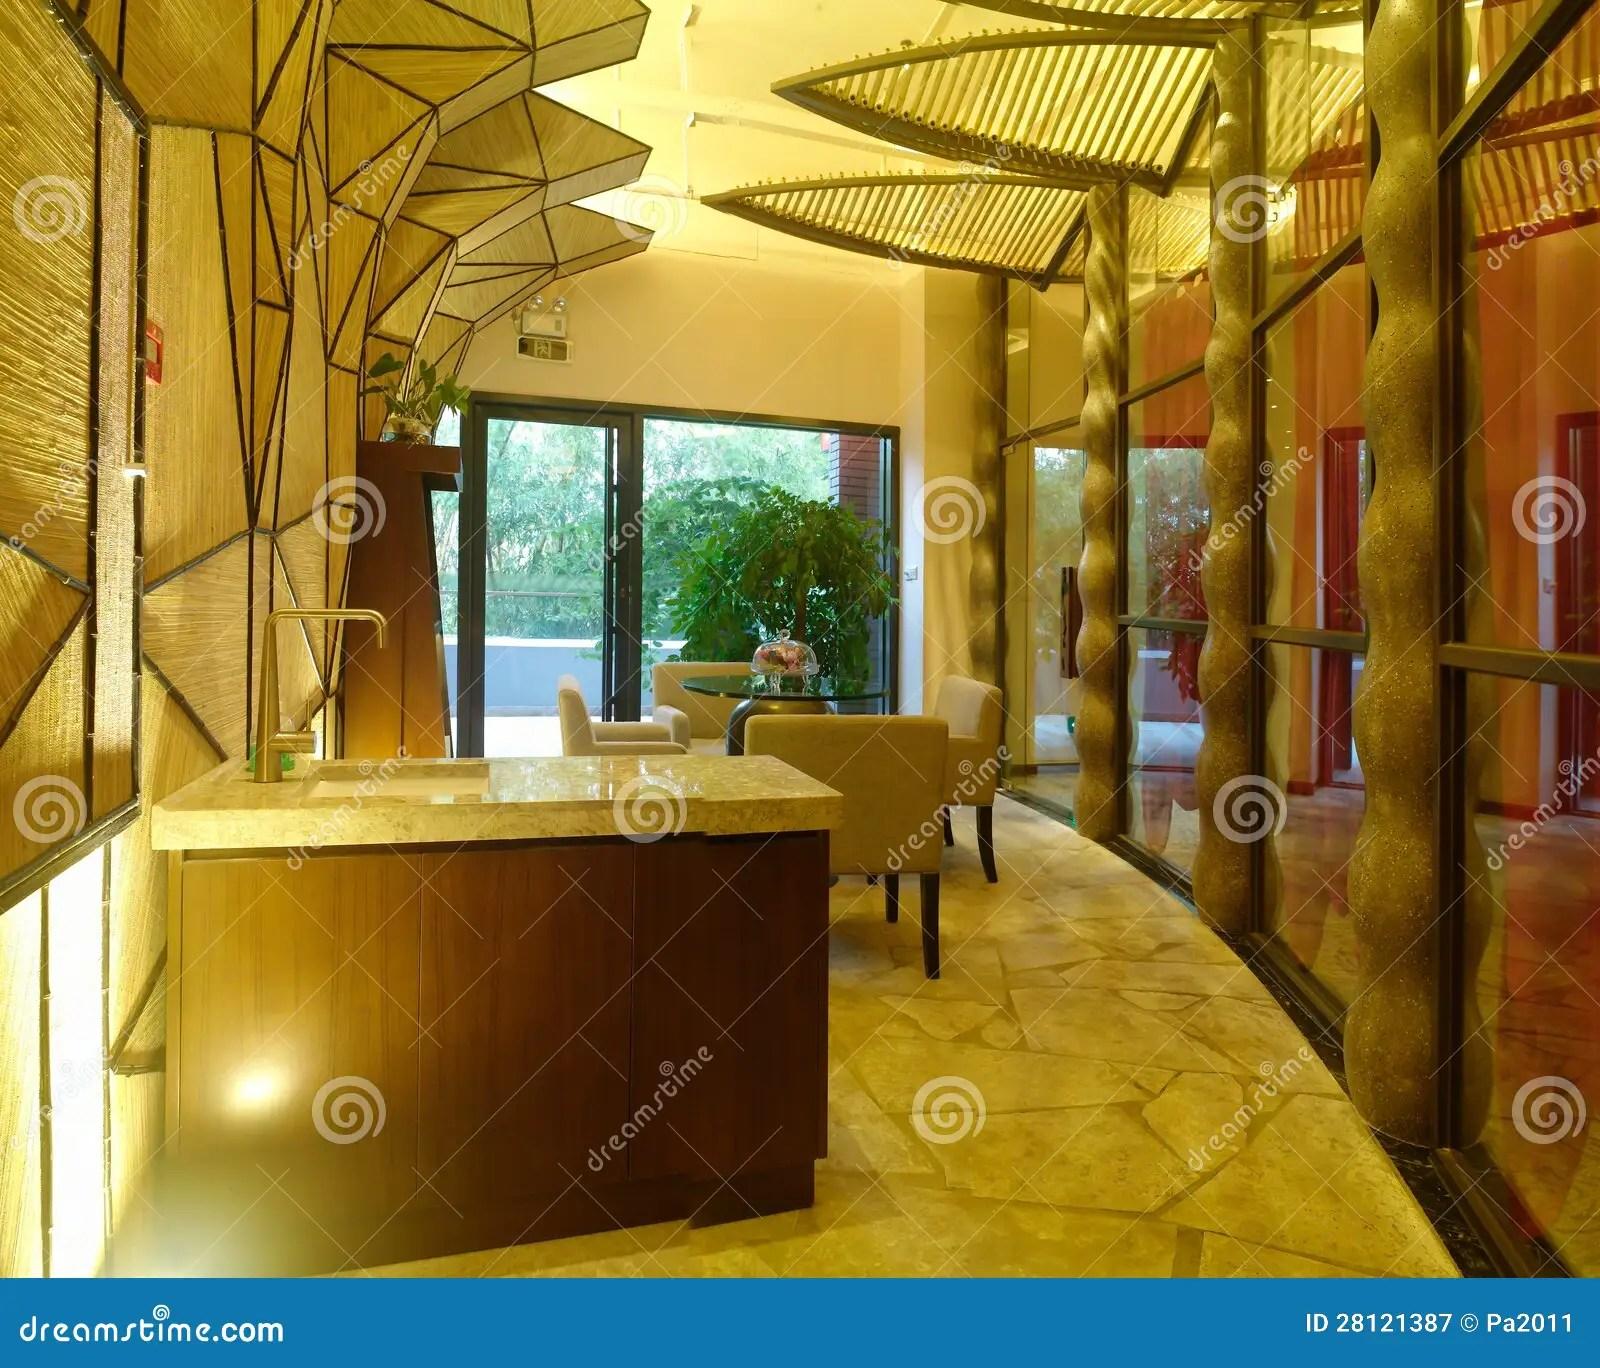 Design Your Bathroom 3d